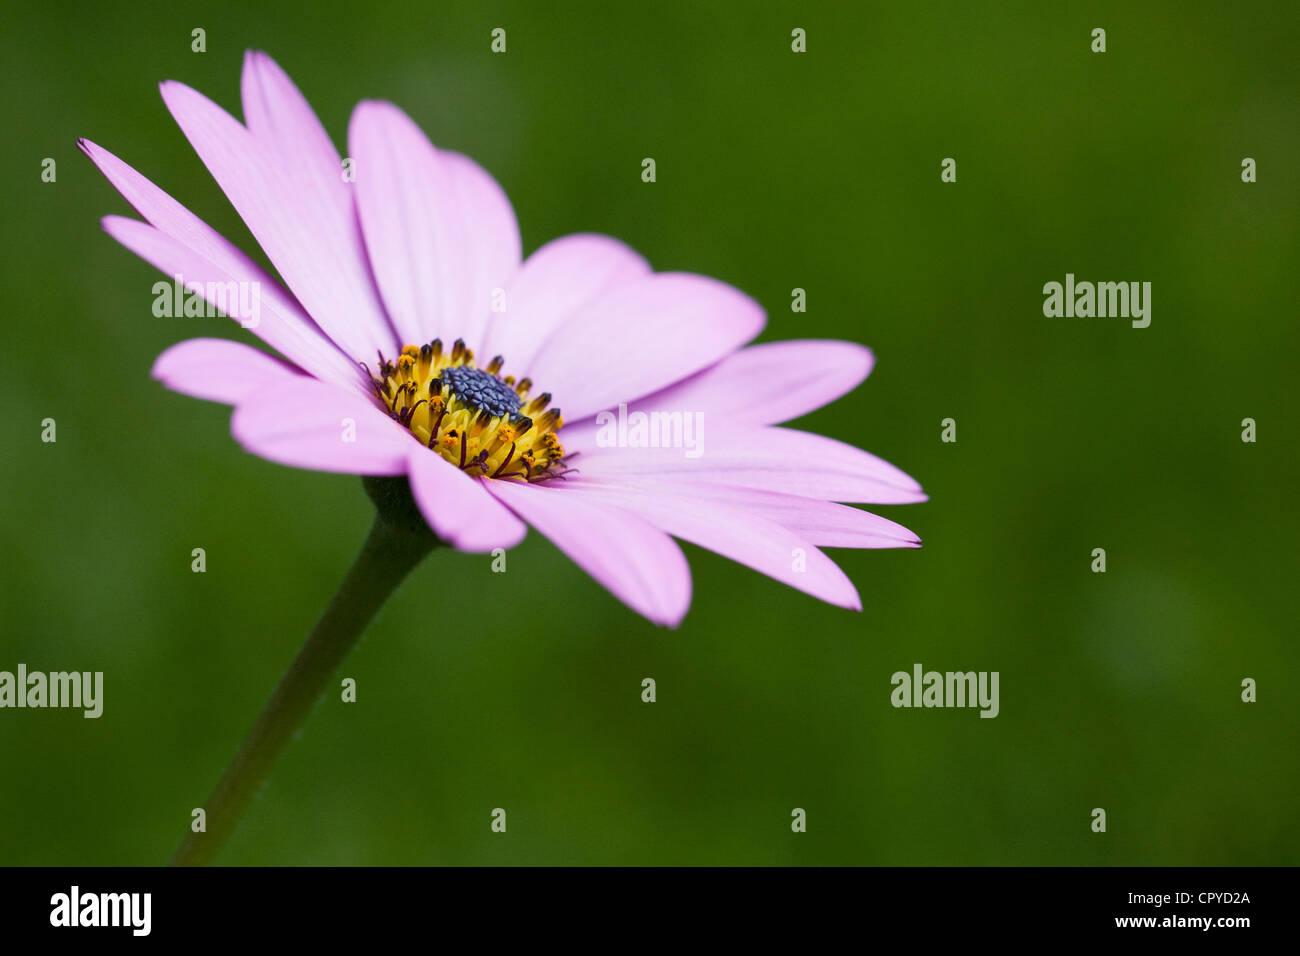 Osteospermum jucundum 'Killerton Pink' flower in the garden. Cape daisy. African daisy. - Stock Image